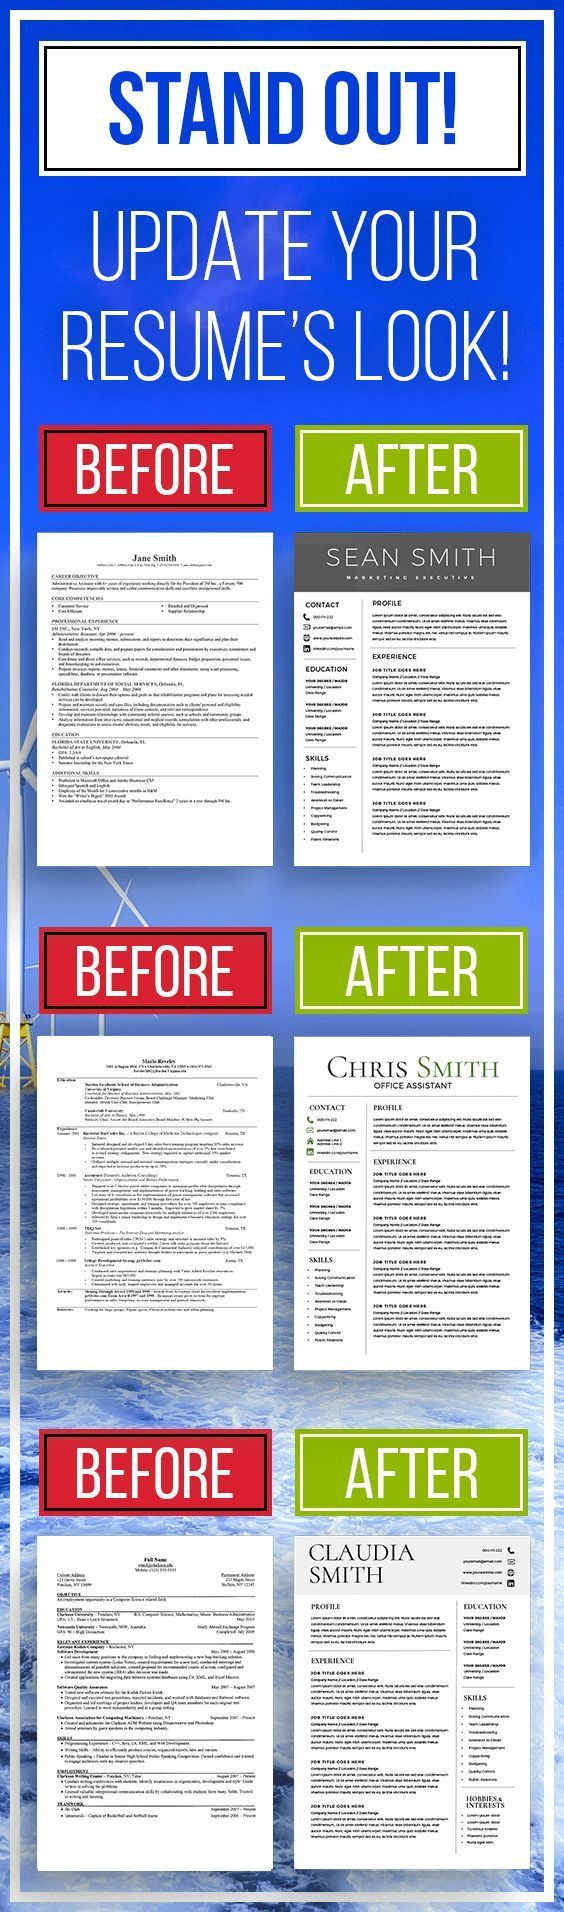 update your resumes look resume update post resume resume upload update my resume updated resume format post my resume cv update updating a resume